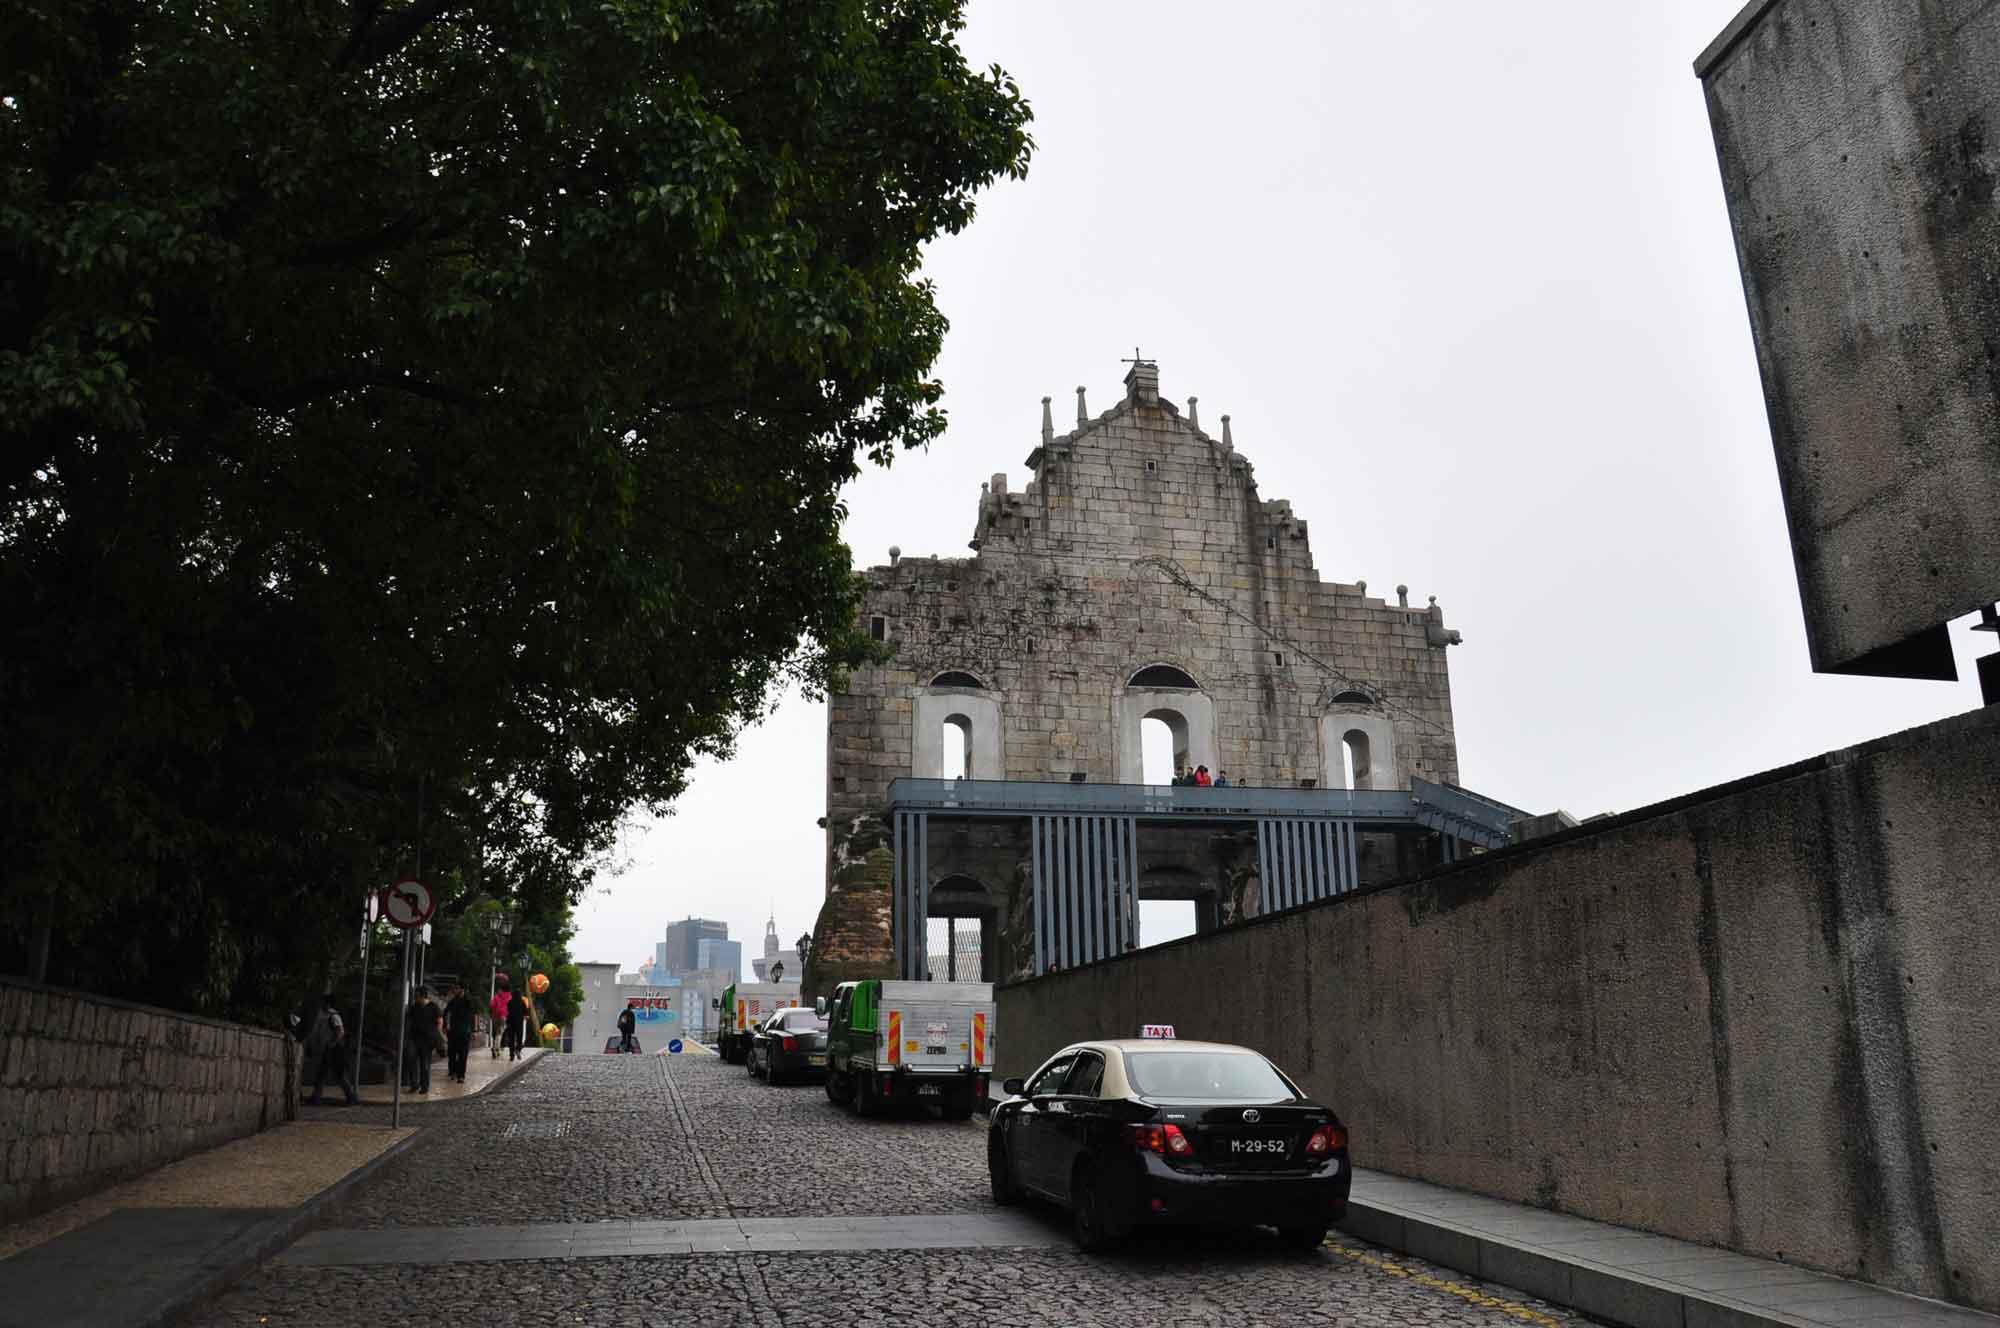 St. Paul's Macau from behind